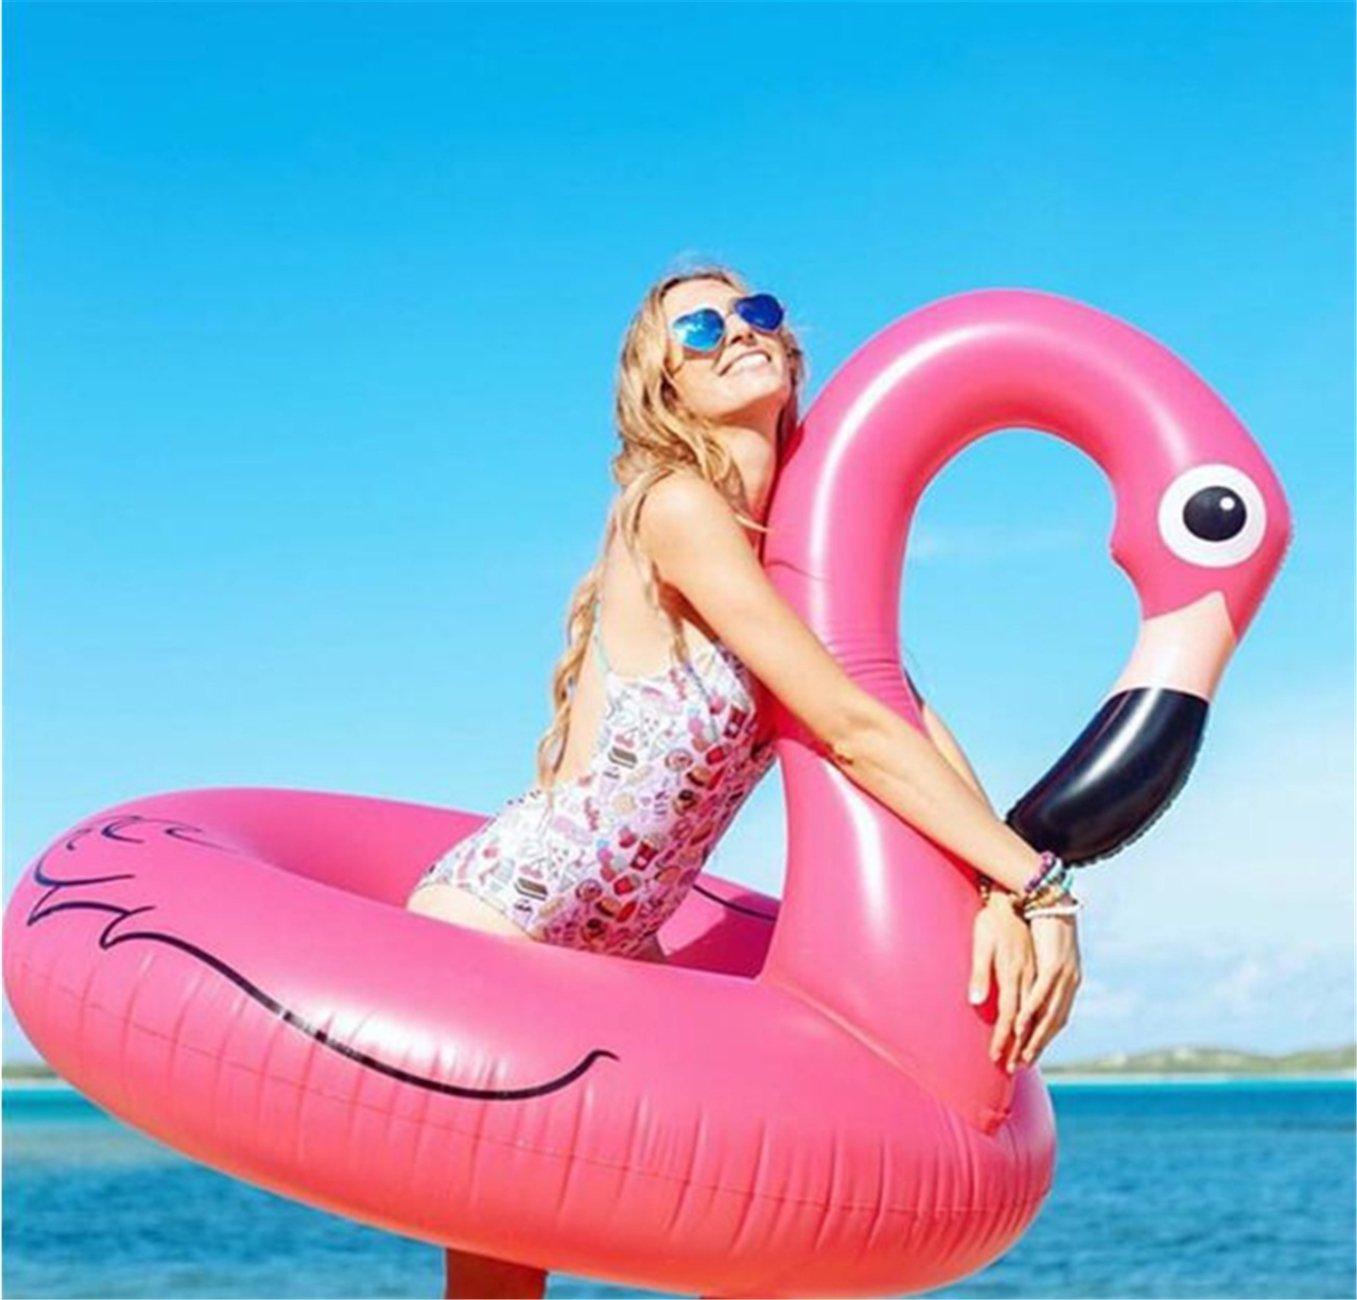 Flotador hinchable en forma de animales, 120 cm, flamenco rosa, para piscina, mar o lago